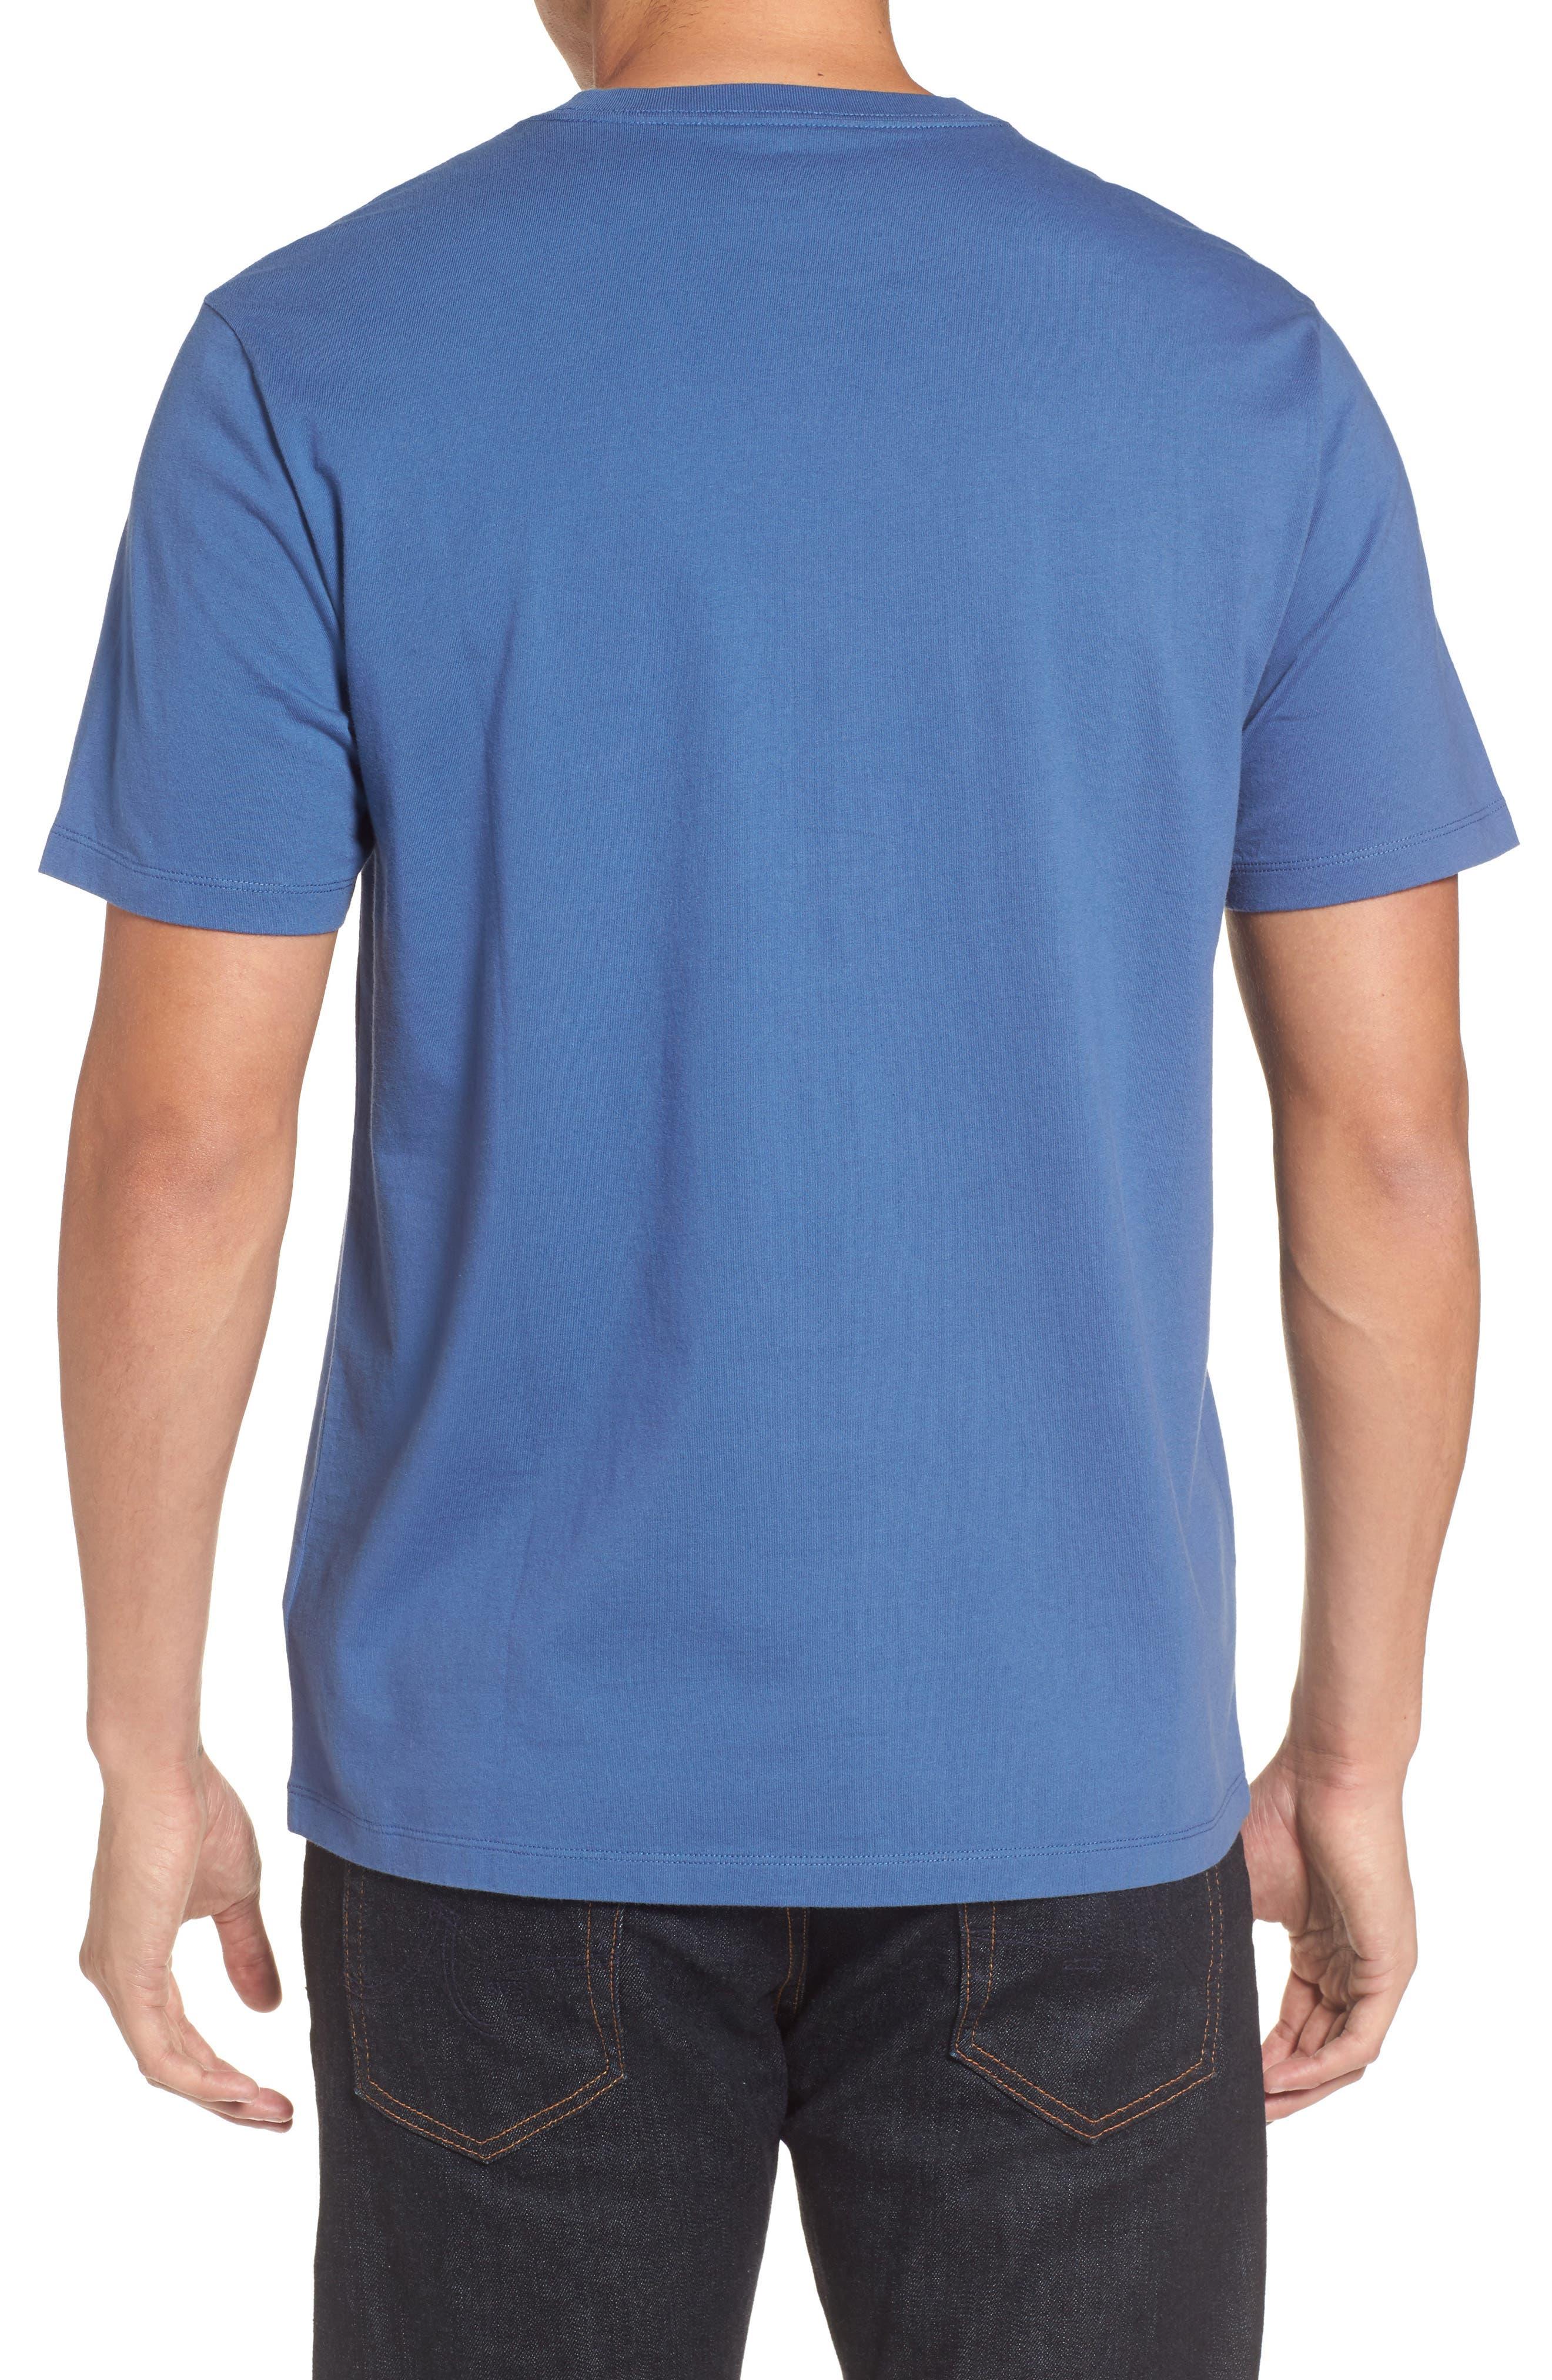 Alternate Image 2  - vineyard vines Sailfish Whale Line Graphic T-Shirt